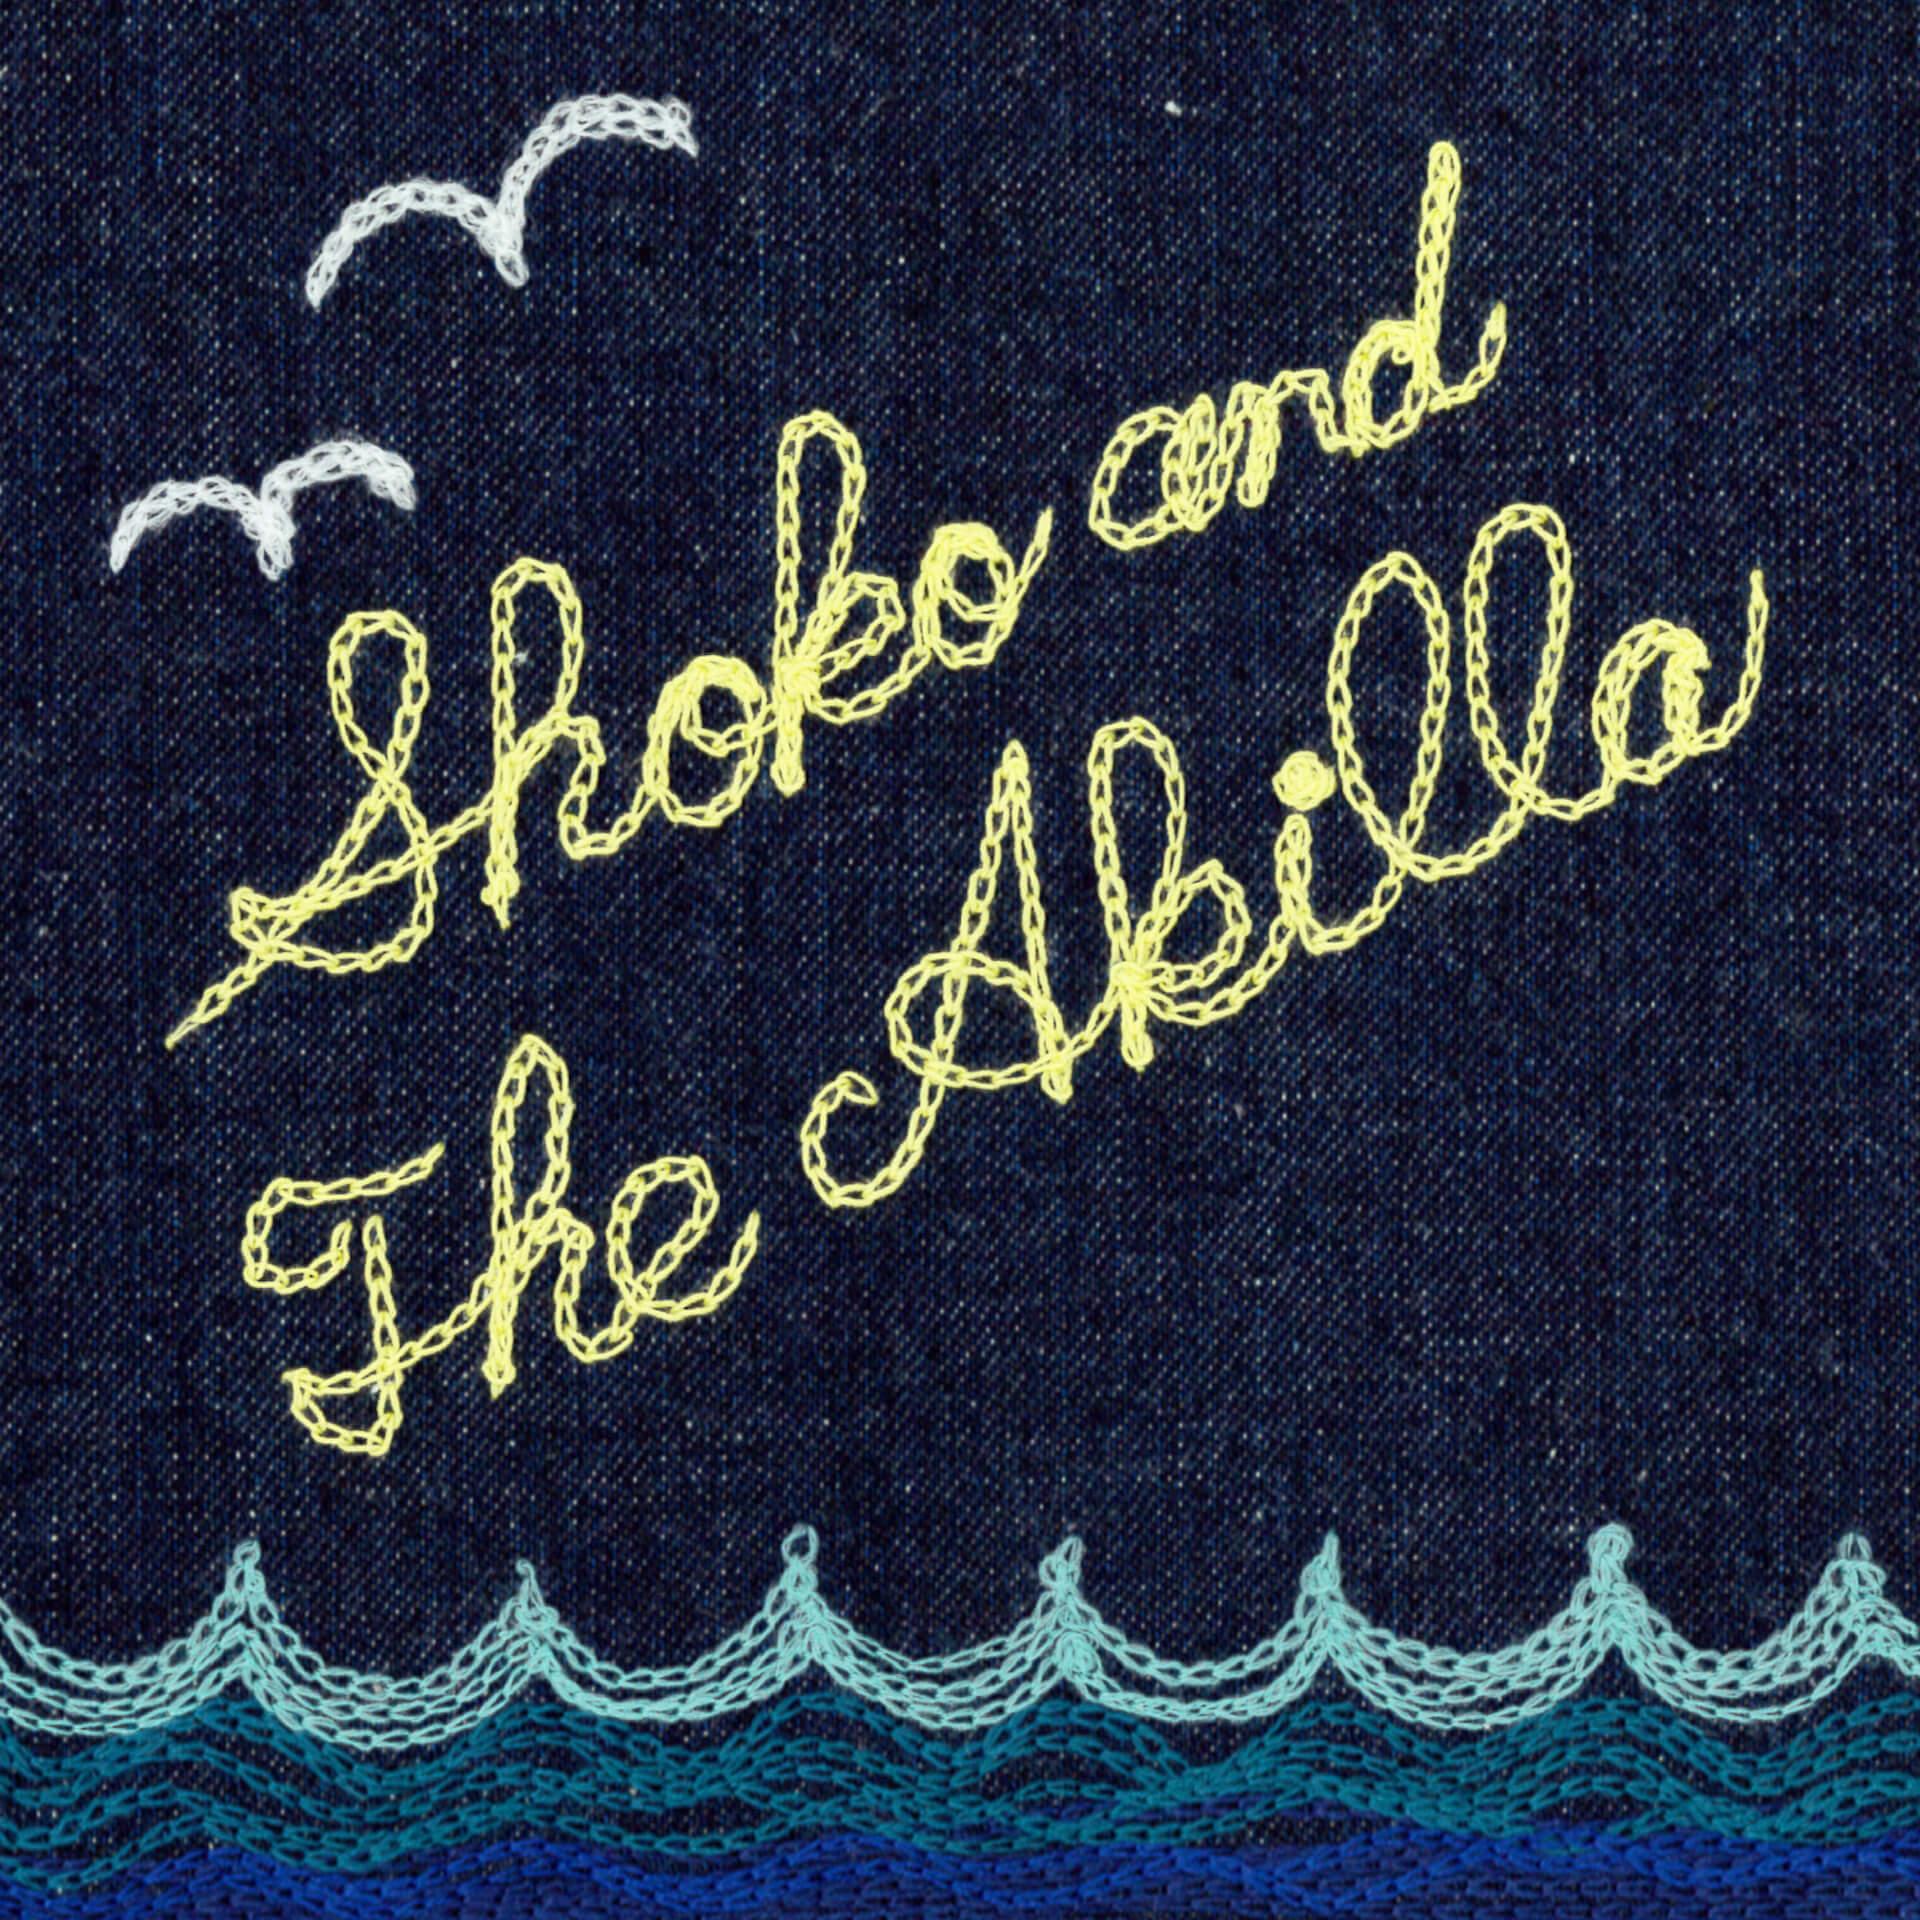 Shoko & The Akilla、本日リリースの1stアルバムからVIDEOTAPEMUSICが手掛けた「Earthy Smells」MVを公開 music200812-shoko-theakilla-2